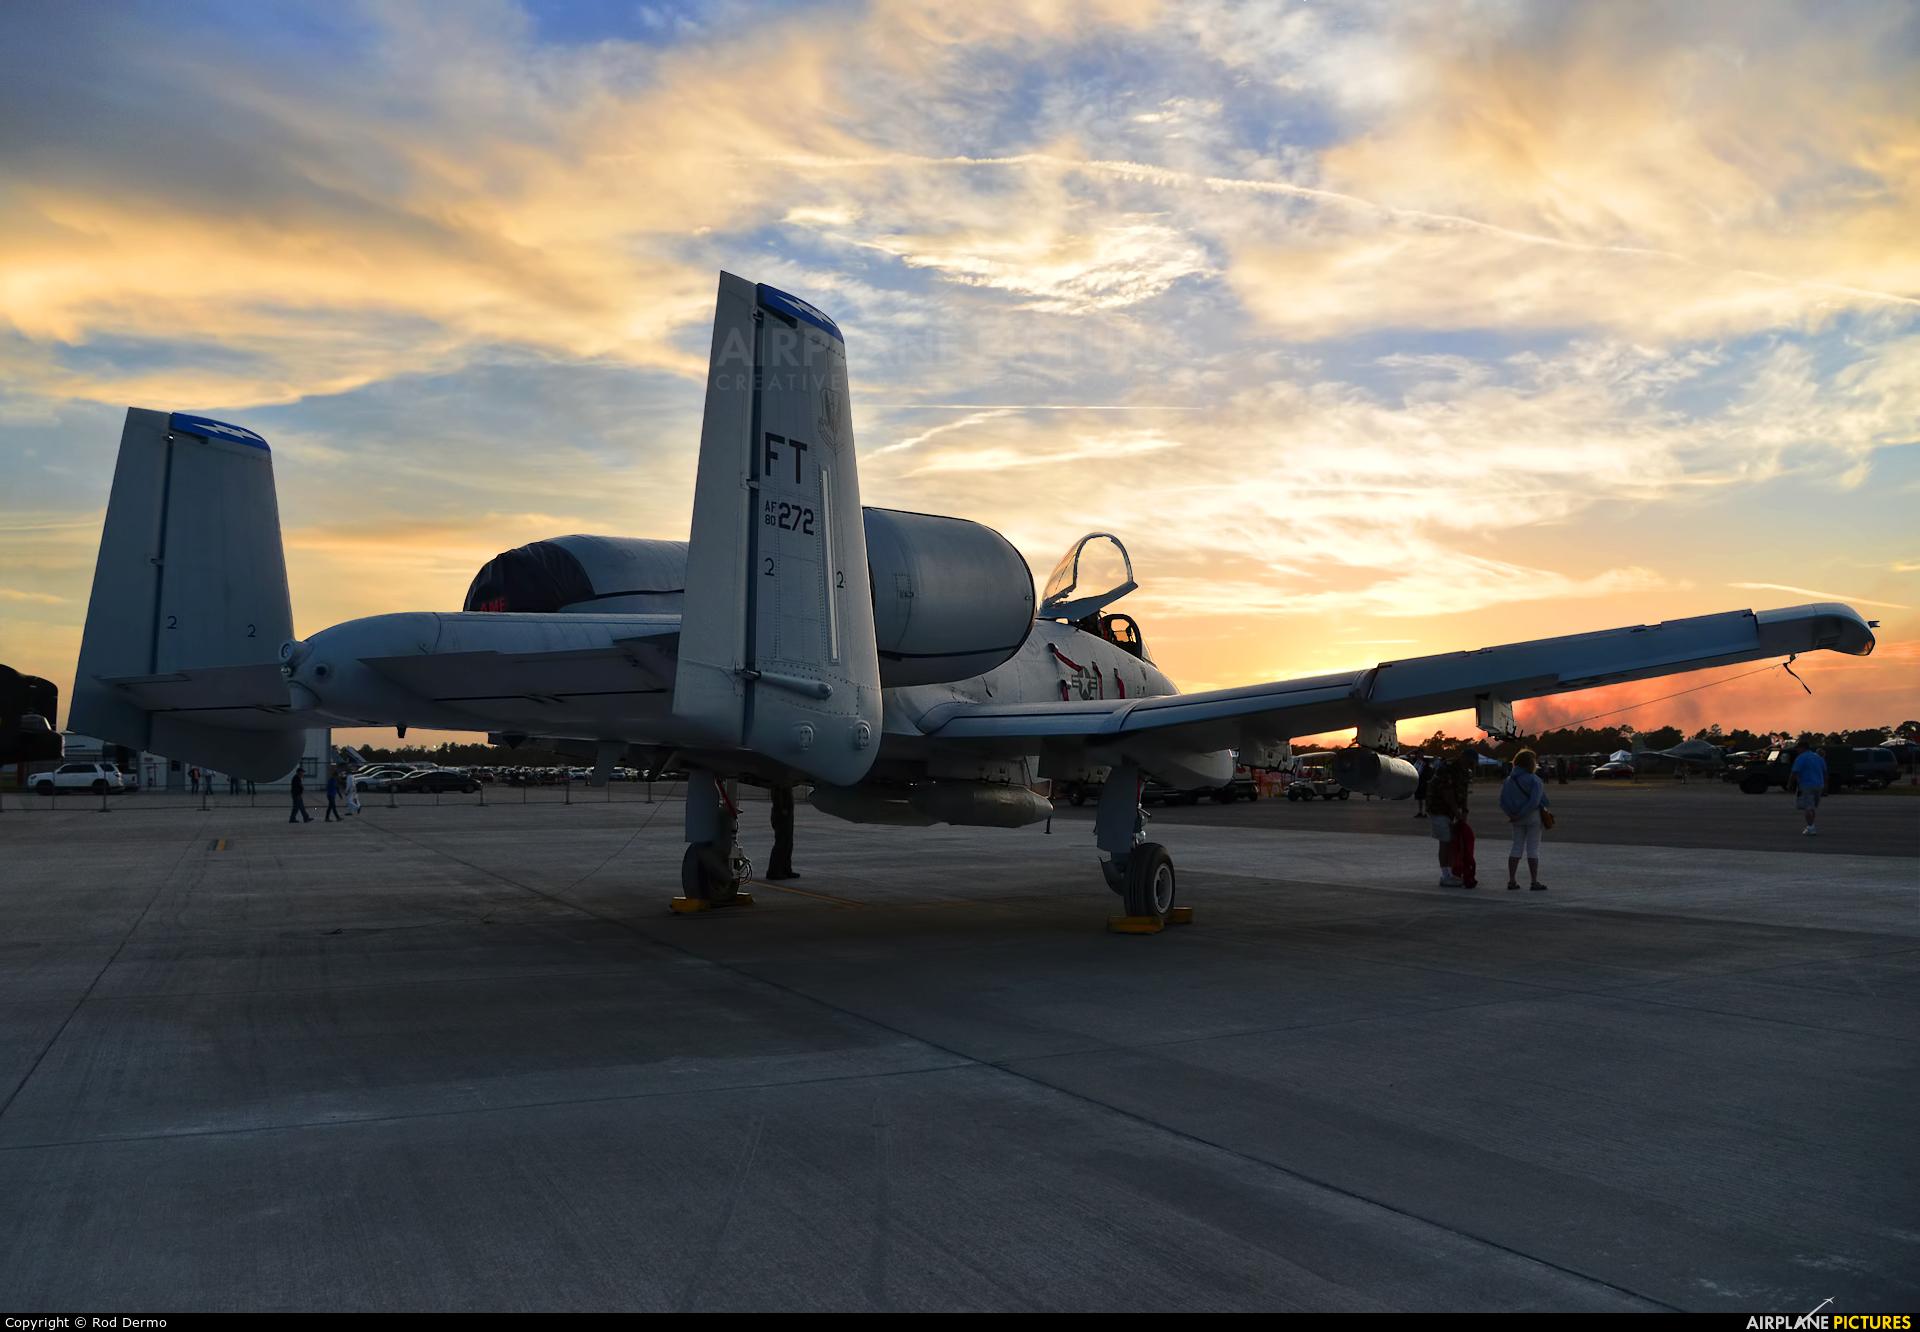 USA - Air Force 80-0272 aircraft at Titusville (Cocoa Beach) - Space Coast Regional